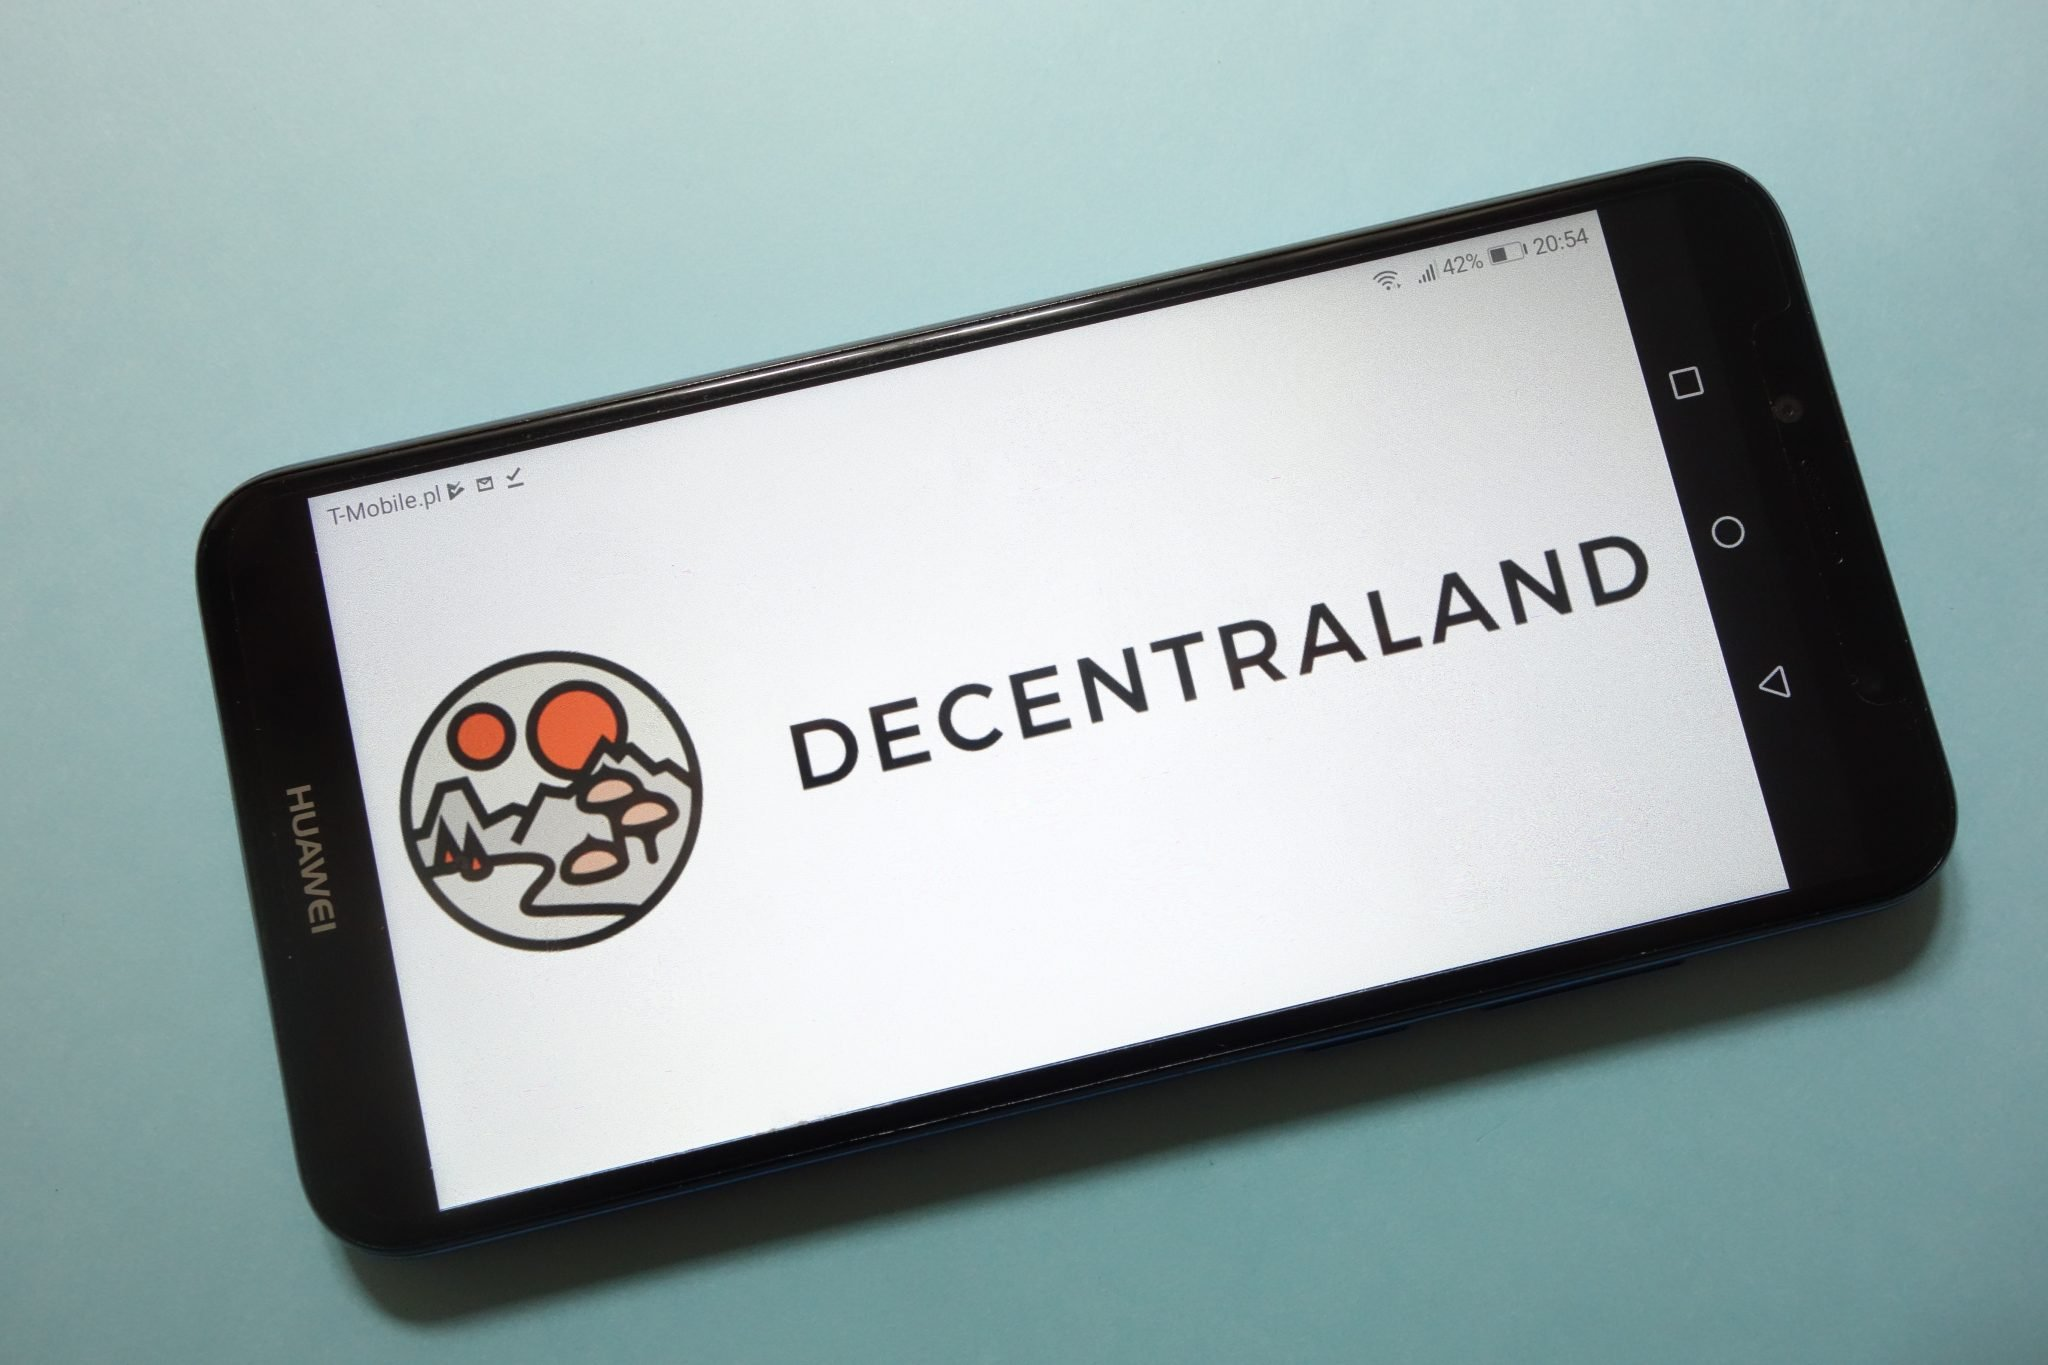 KONSKIE, POLAND - November 17, 2018: Decentraland (MANA) cryptocurrency logo displayed on smartphone